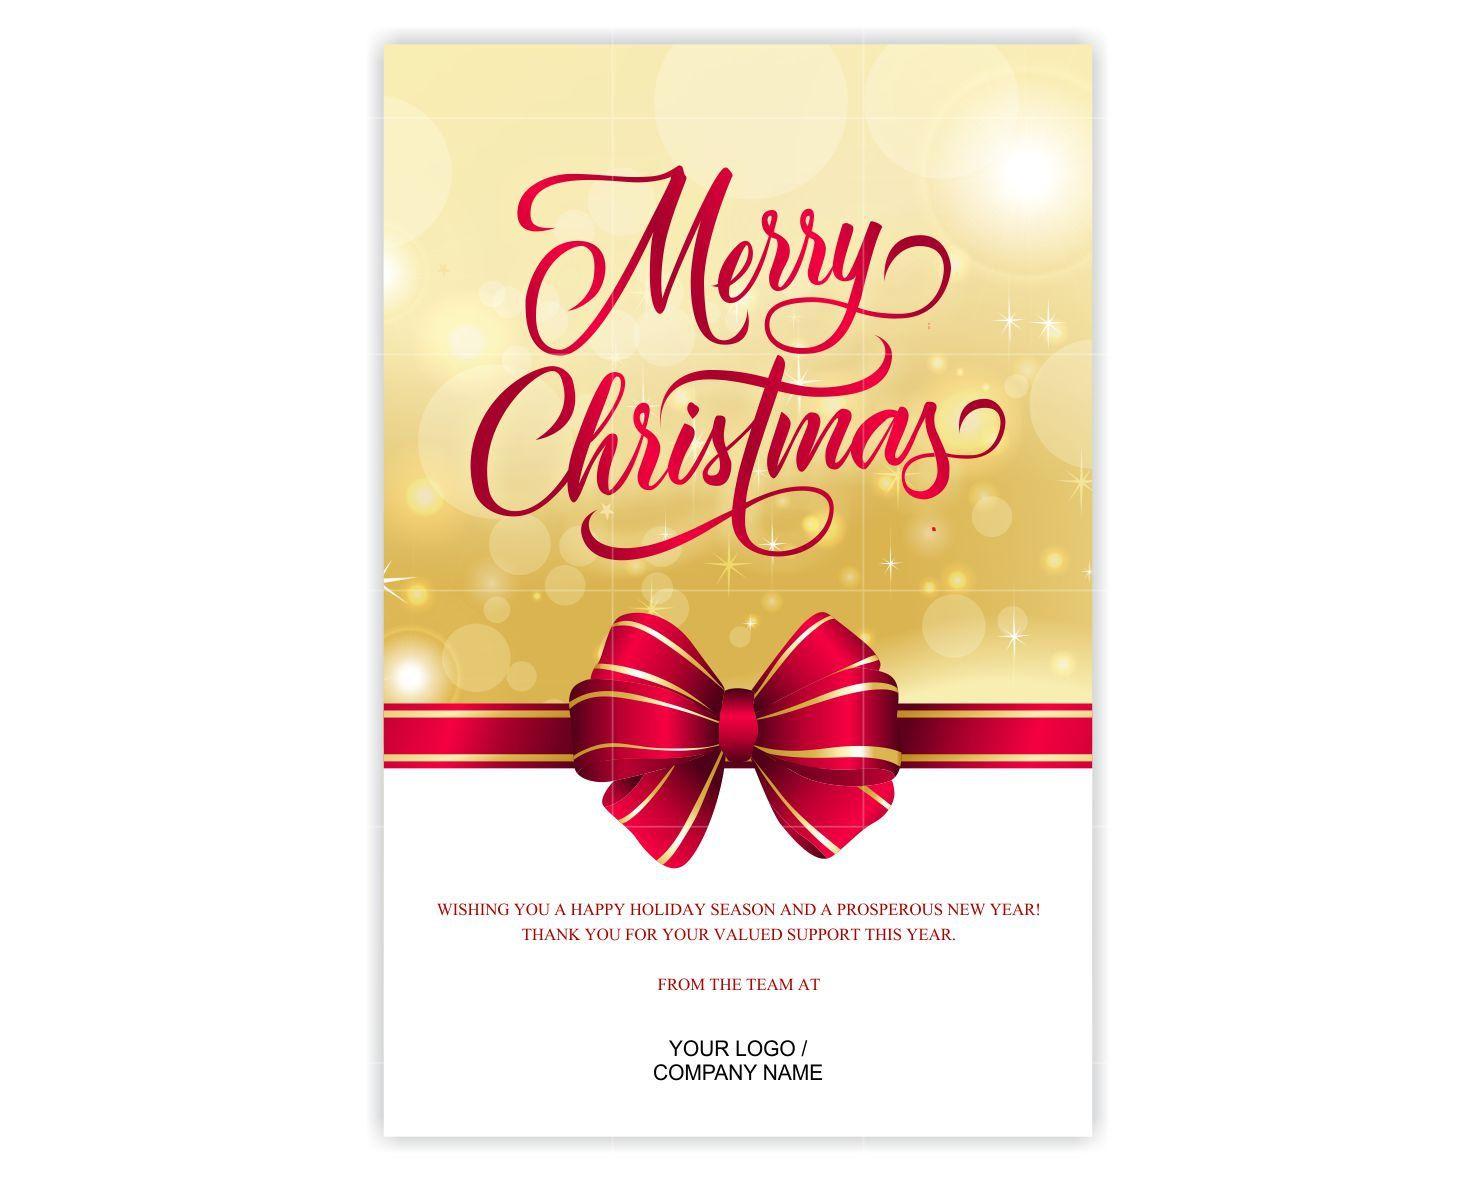 Custom corporate greeting card business greeting card cg001 custom corporate greeting card business greeting card cg001 flat printed cards supplied magicingreecefo Gallery